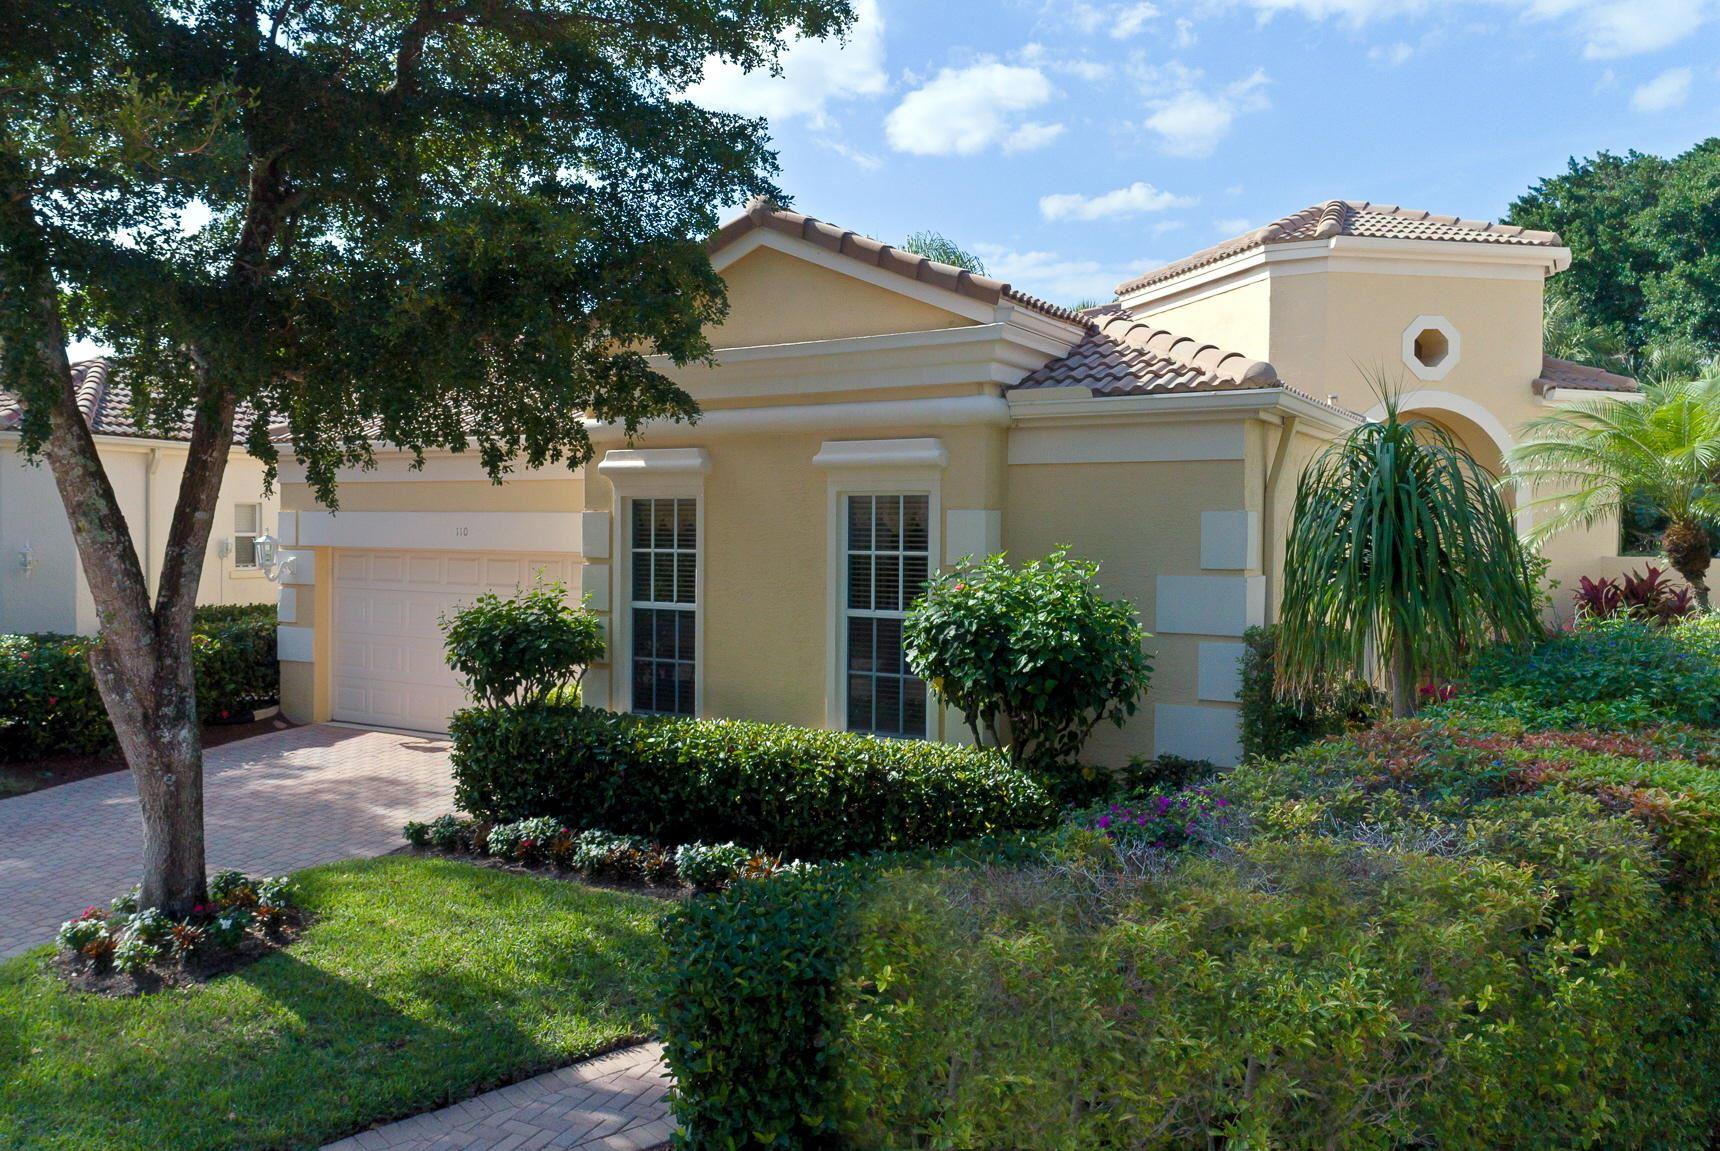 Photo of 110 Sunset Bay Drive, Palm Beach Gardens, FL 33418 (MLS # RX-10631196)